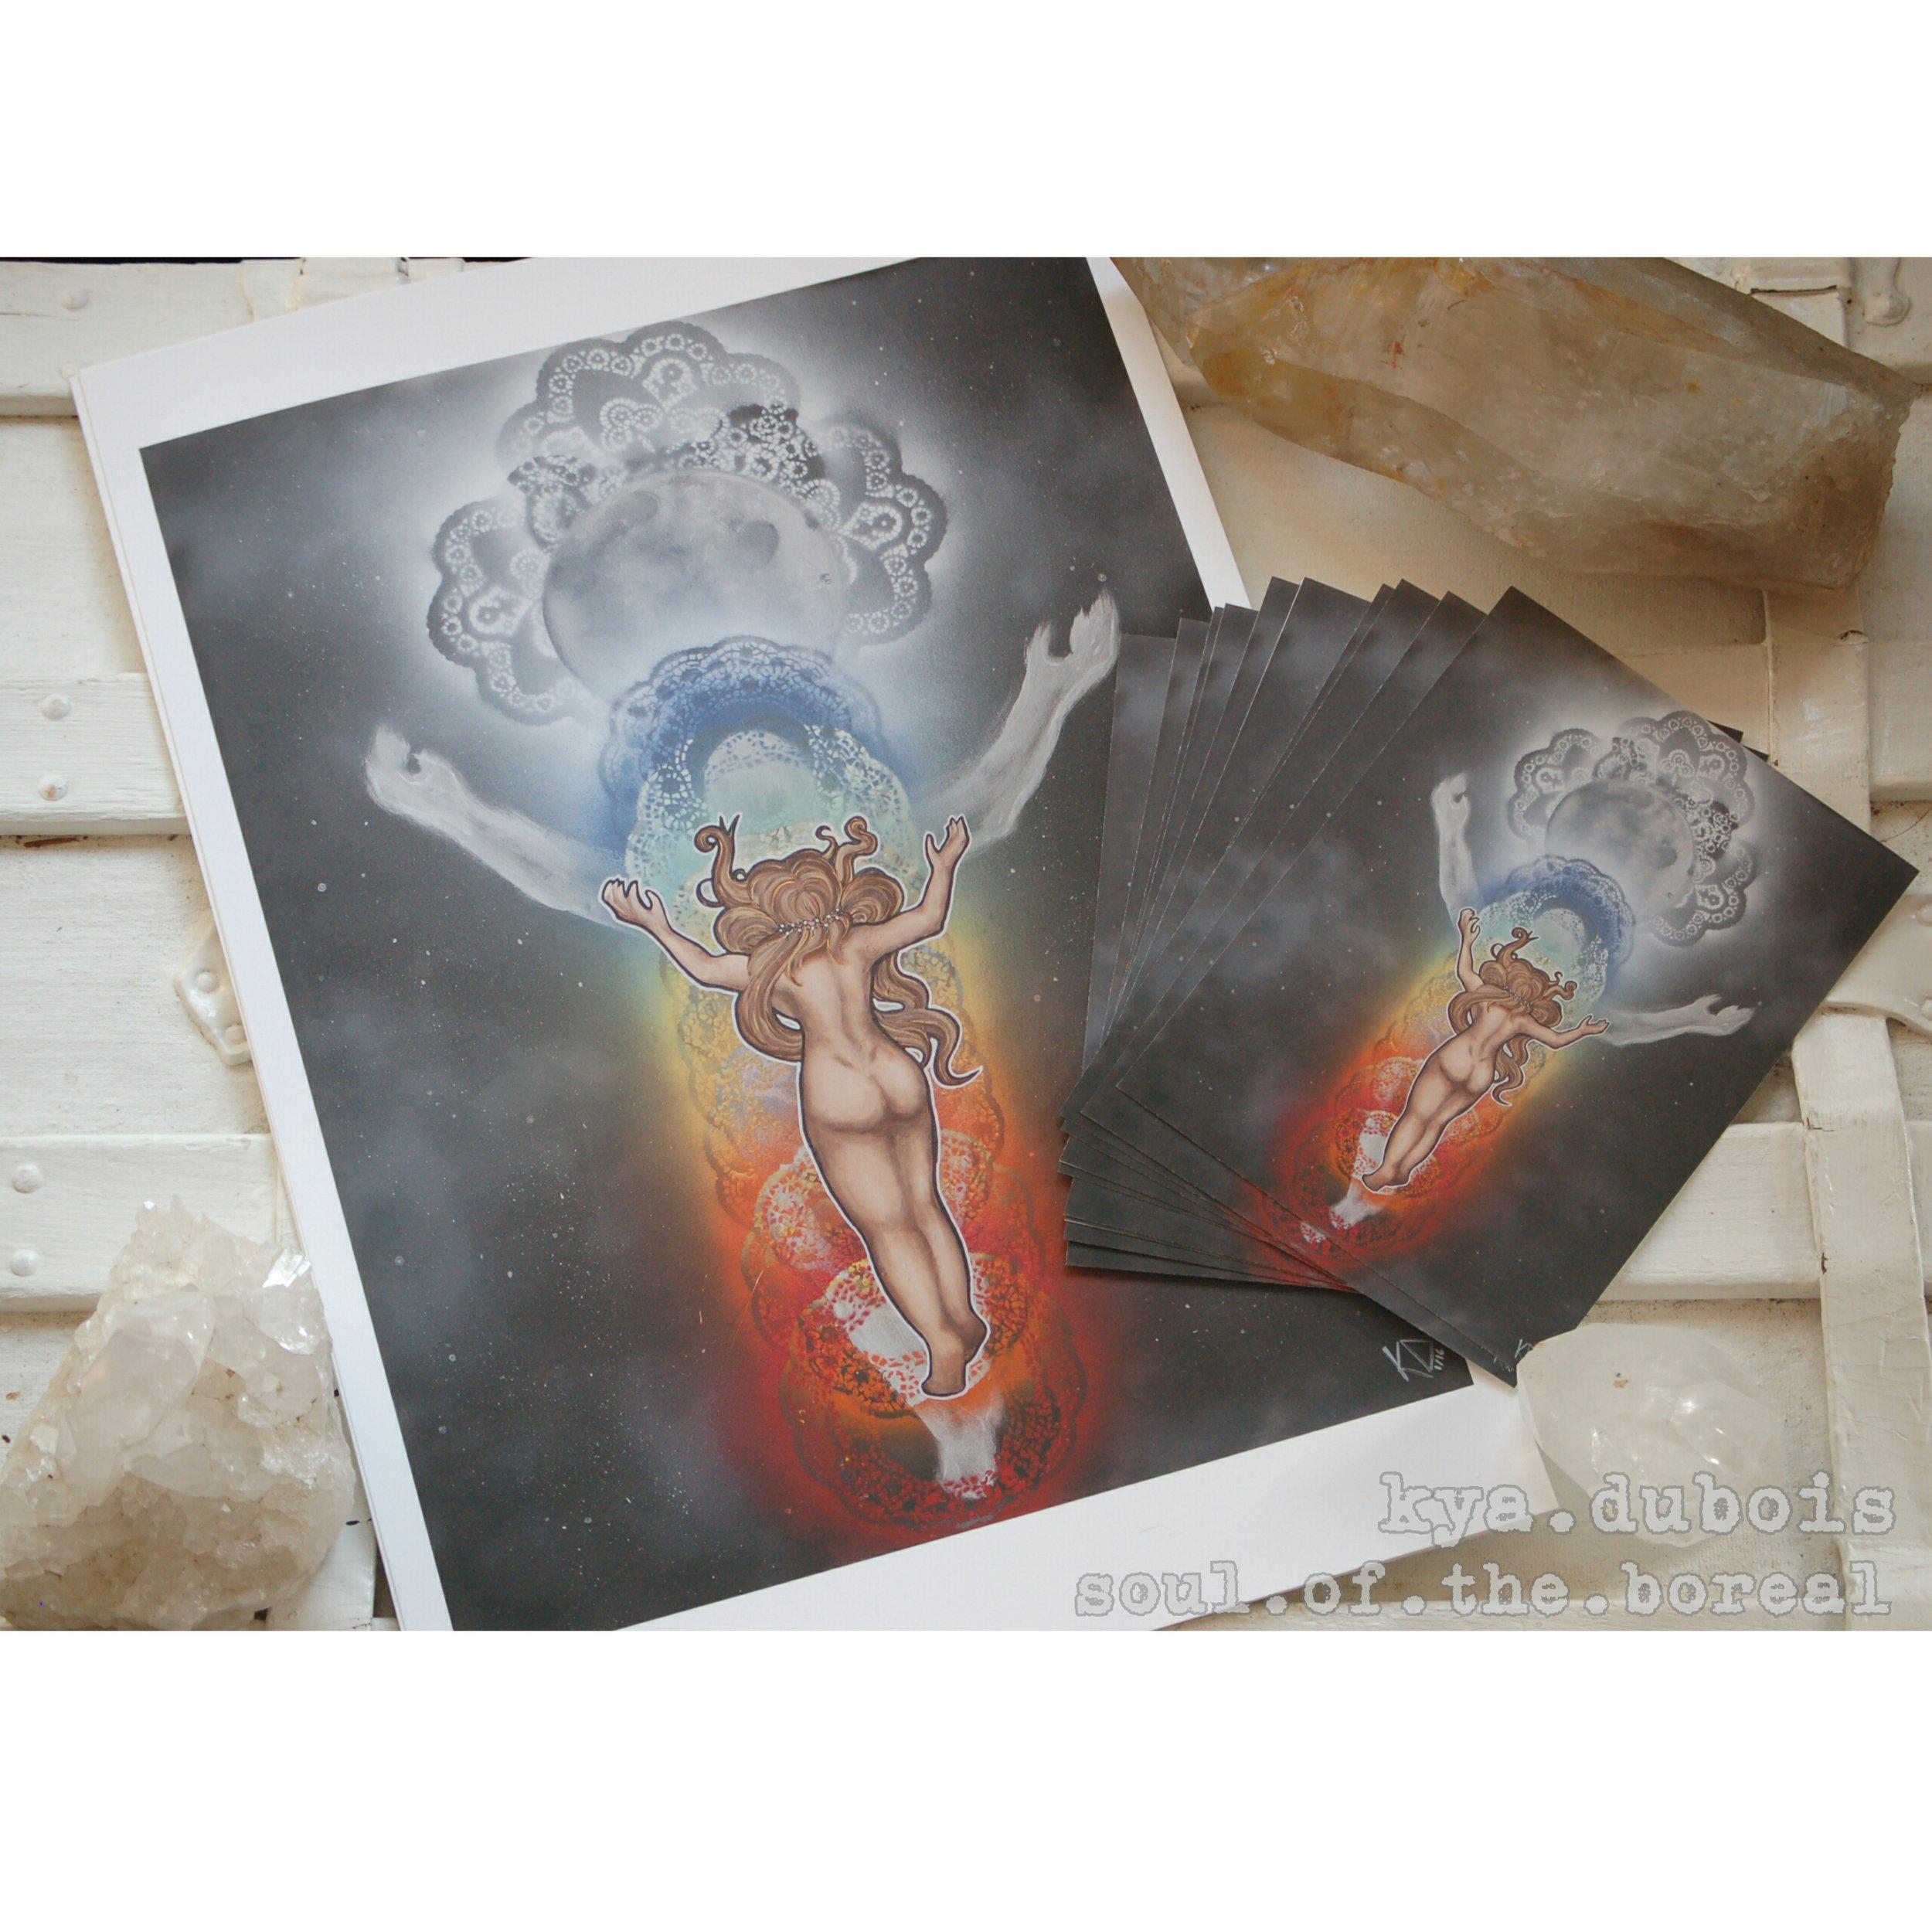 """The Energetic Body"" - Prints $5/$25"